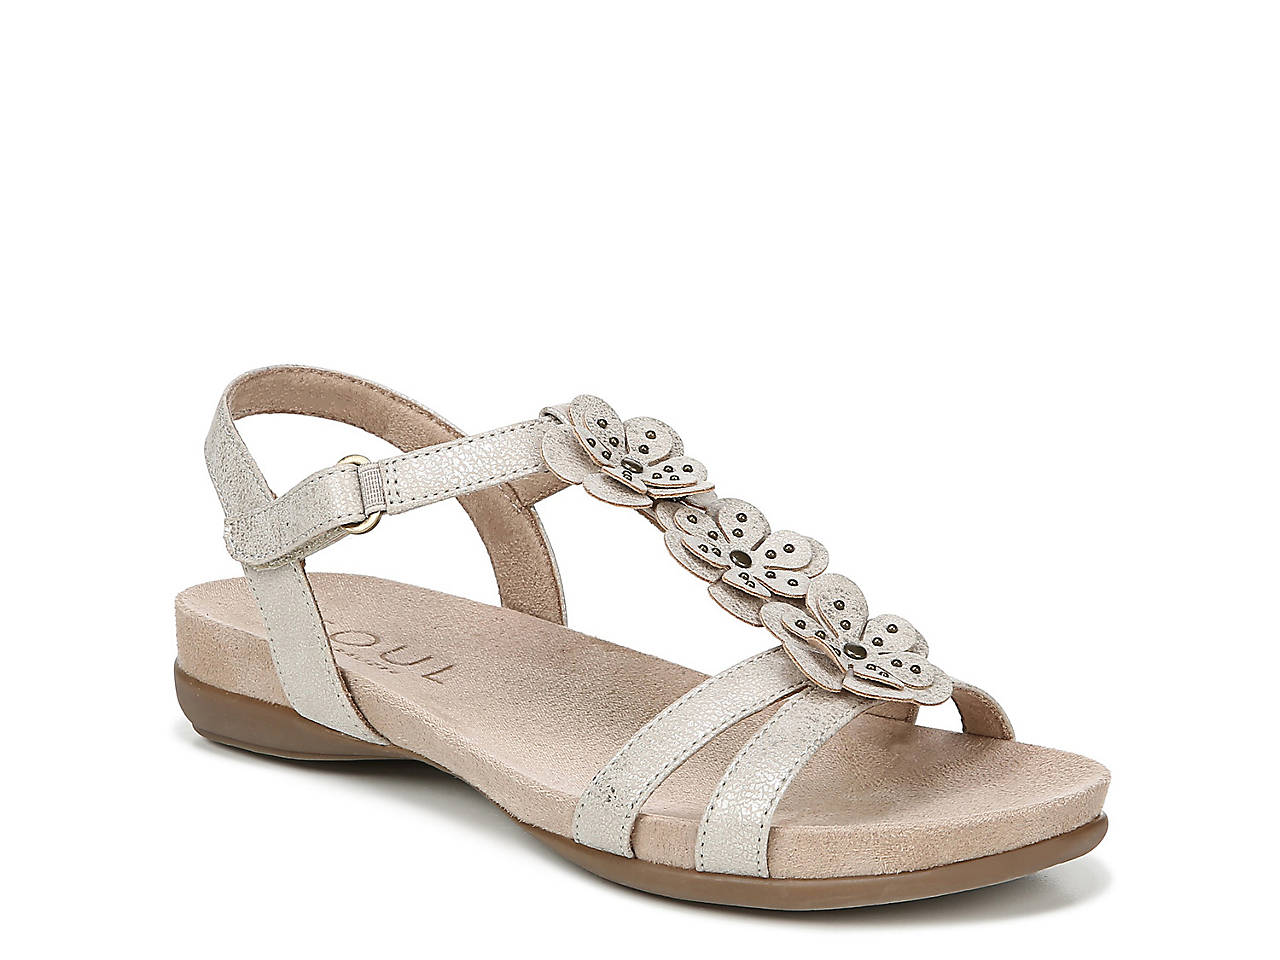 ddd9c16e1 SOUL Naturalizer Alivia Sandal Women s Shoes